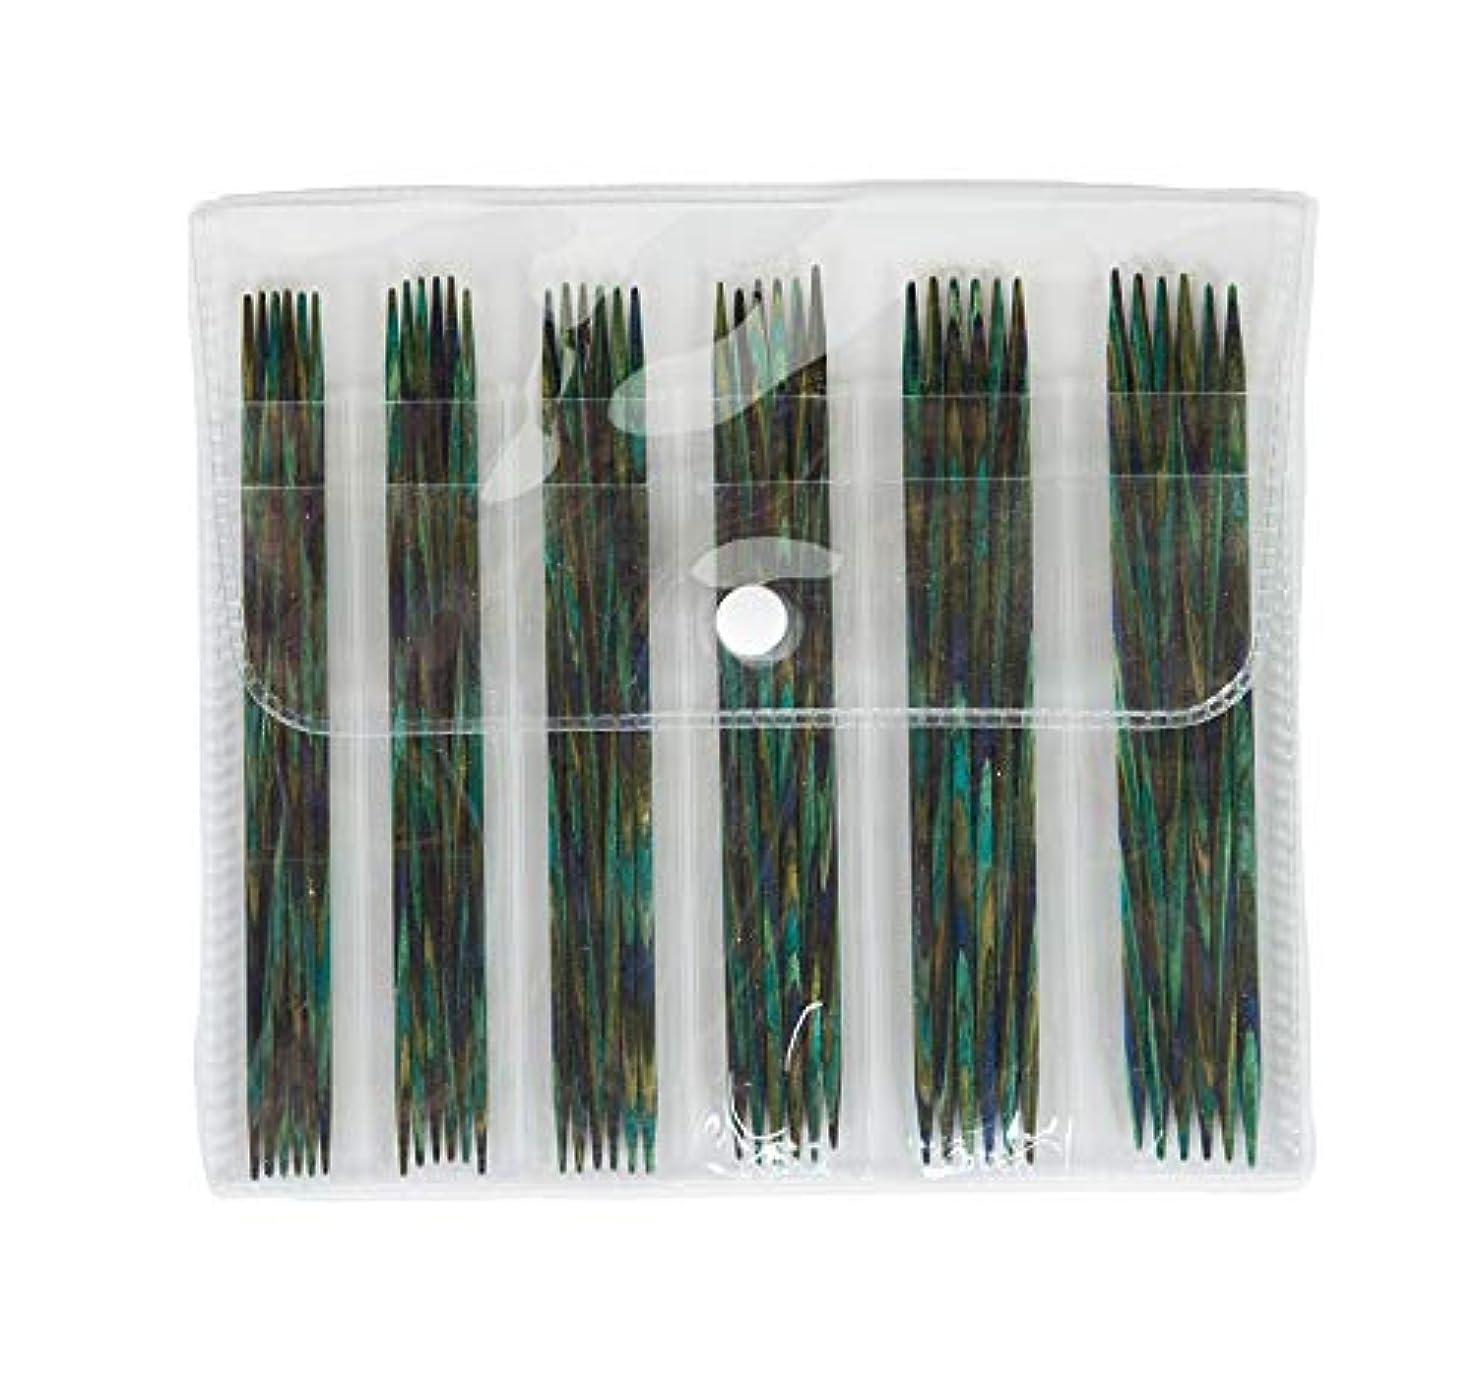 Knit Picks 5